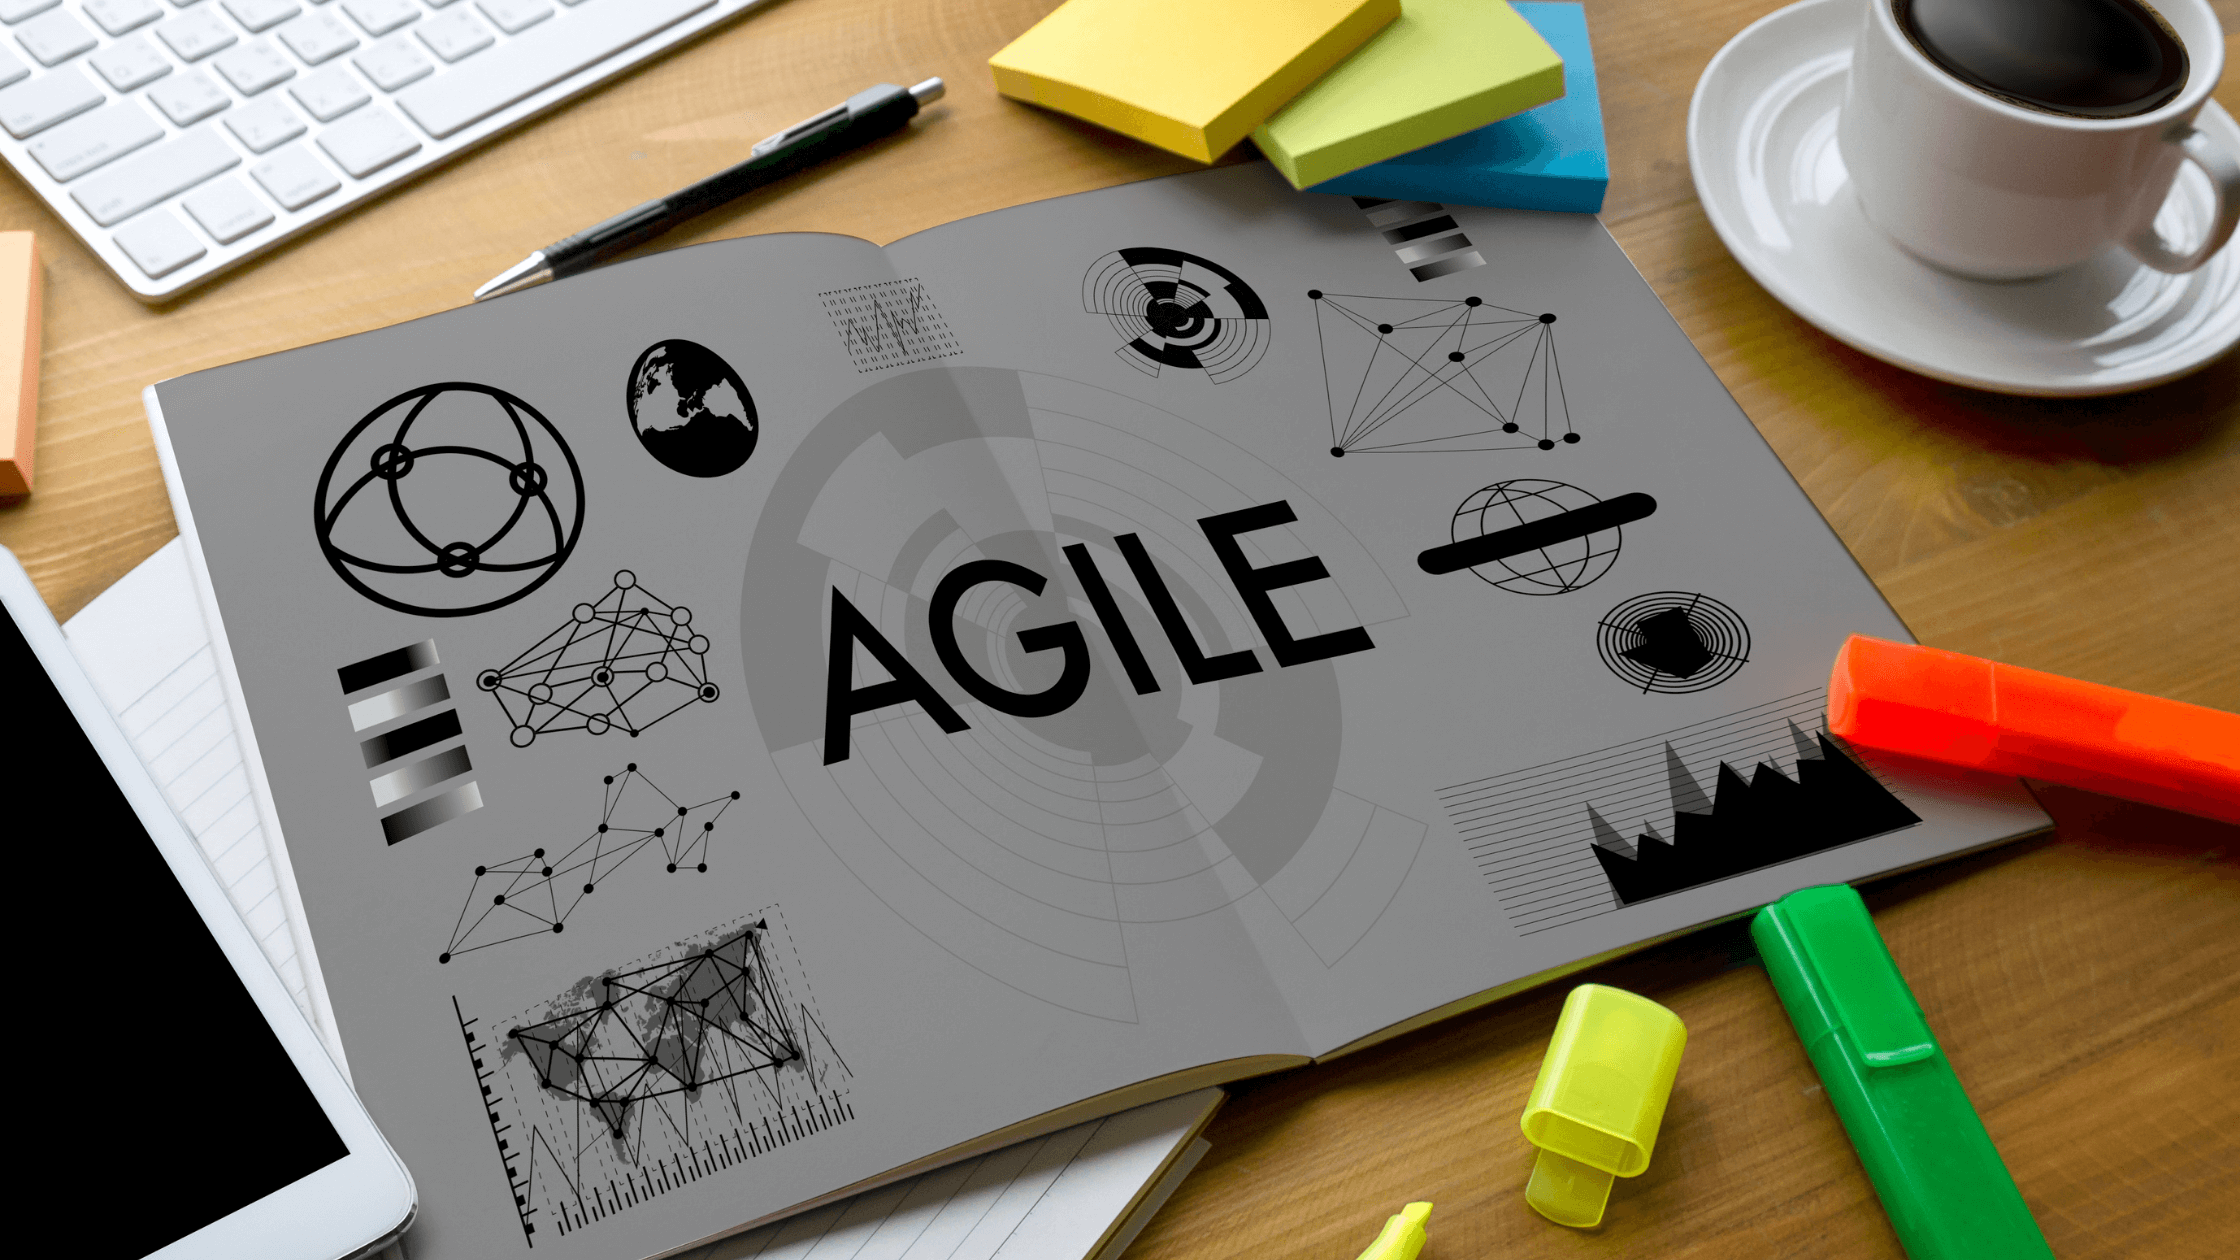 Agile analytics graphic above office desk